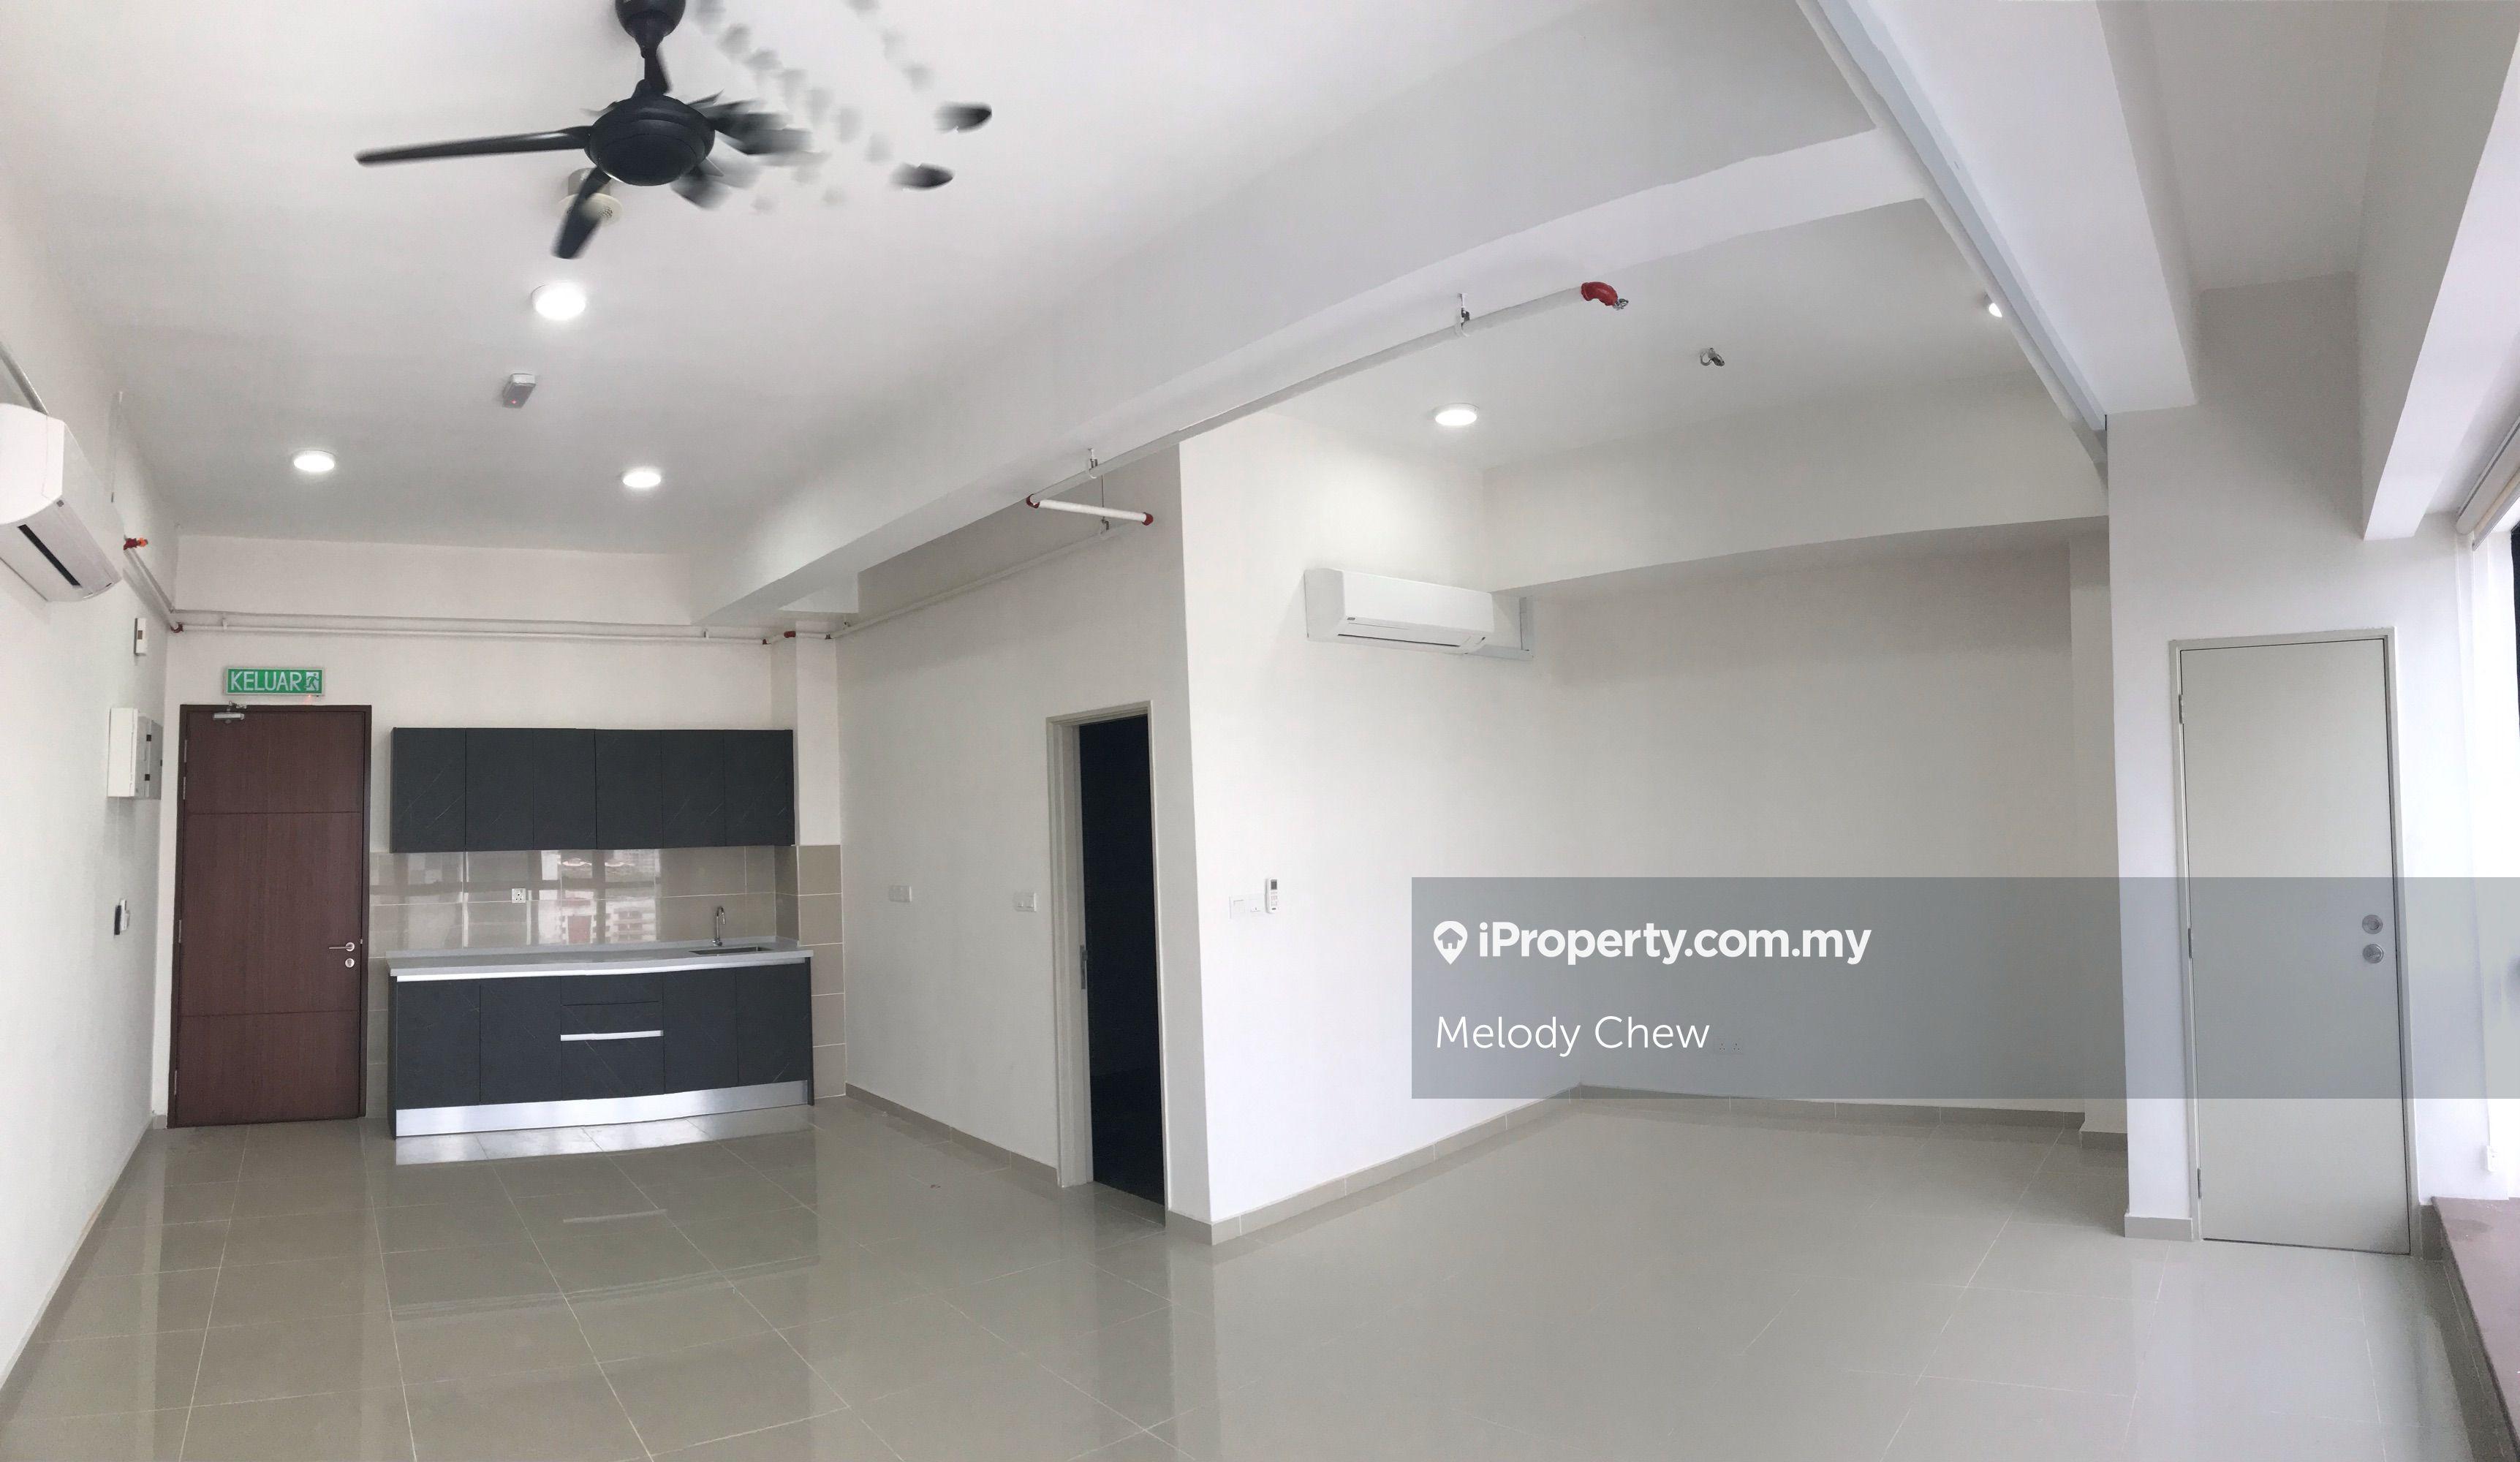 AURORA SOVO OFFICE, AURORA PLACE , BUKIT JALIL CITY,BUKIT JALIL, BUKIT JALIL, Bukit Jalil